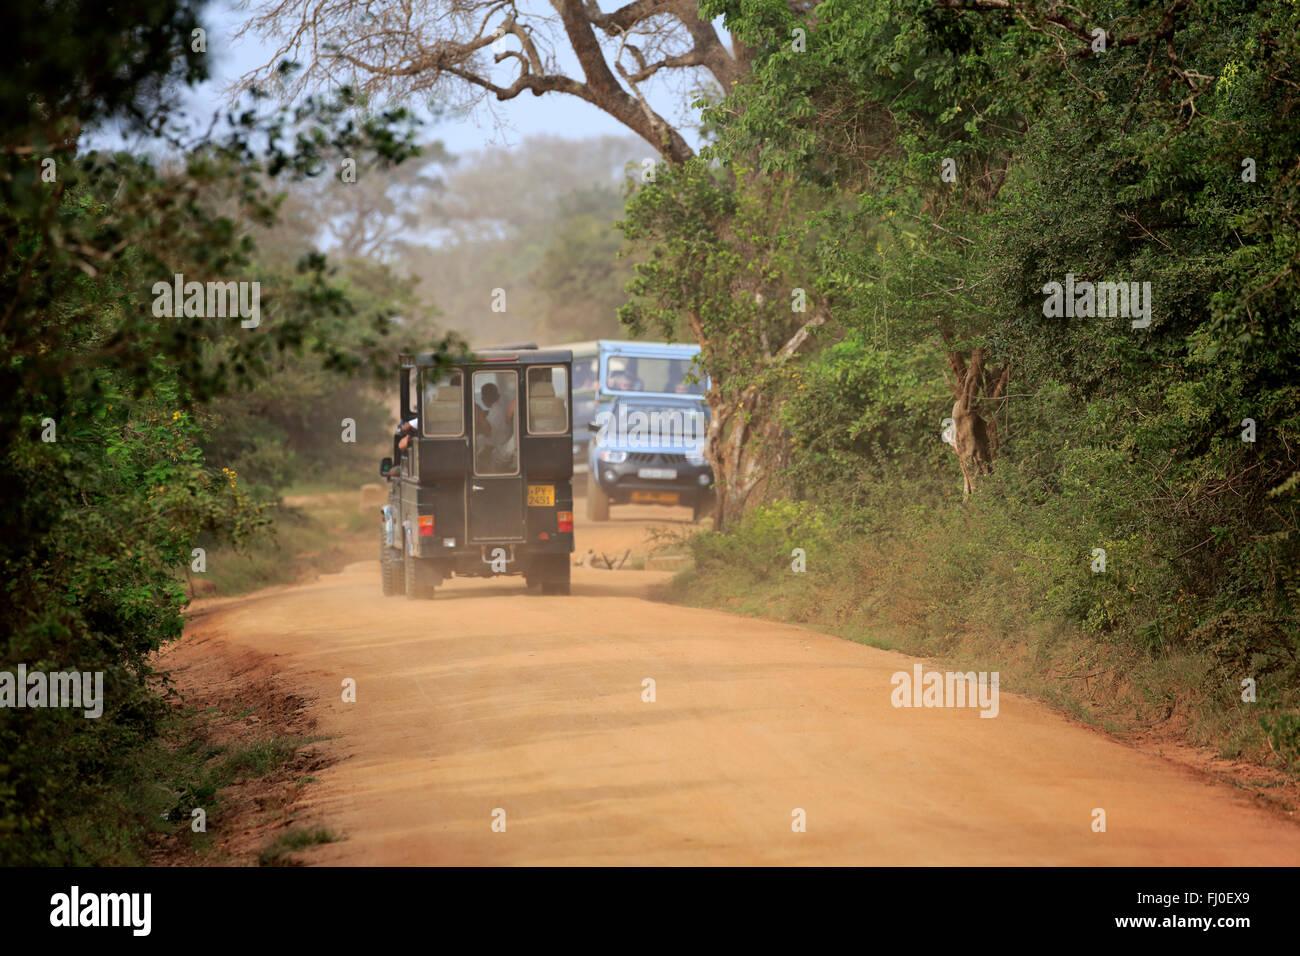 Safari-Fahrzeug, Pirschfahrt mit Touristen in Yala Nationalpark Yala Nationalpark, Sri Lanka, Asien Stockbild